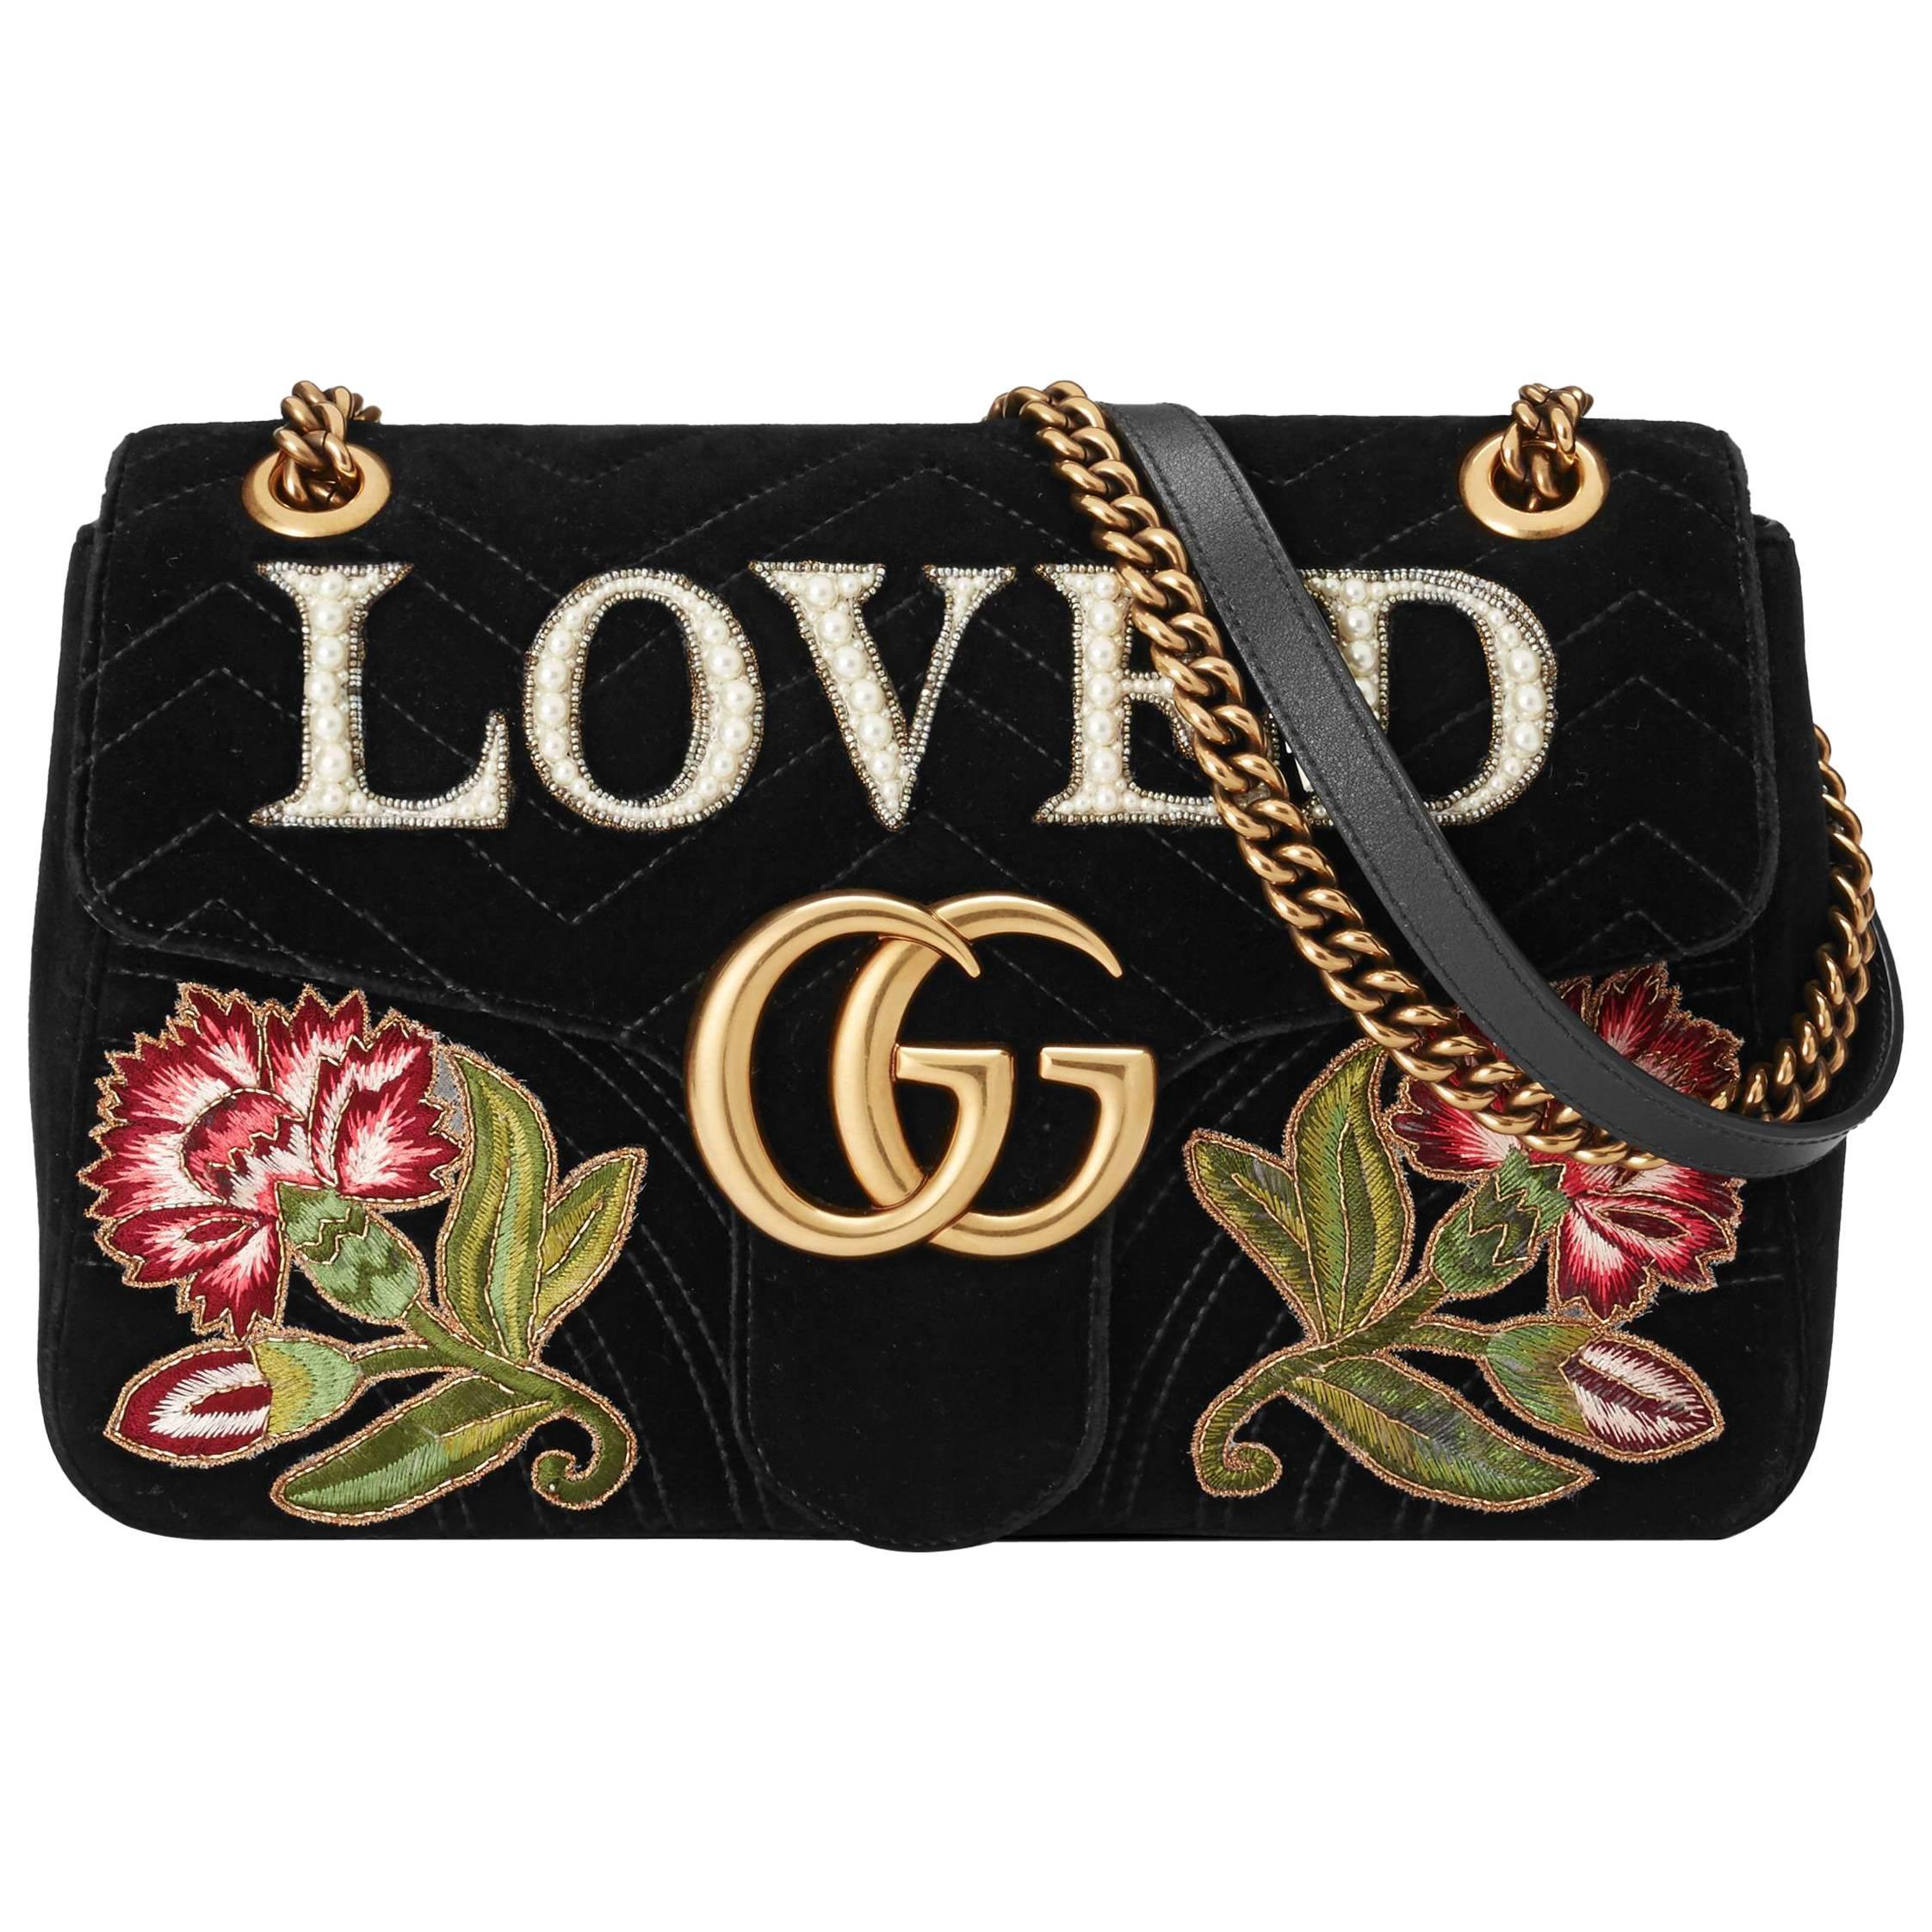 Pre-owned - Marmont velvet handbag Gucci ADC1xt